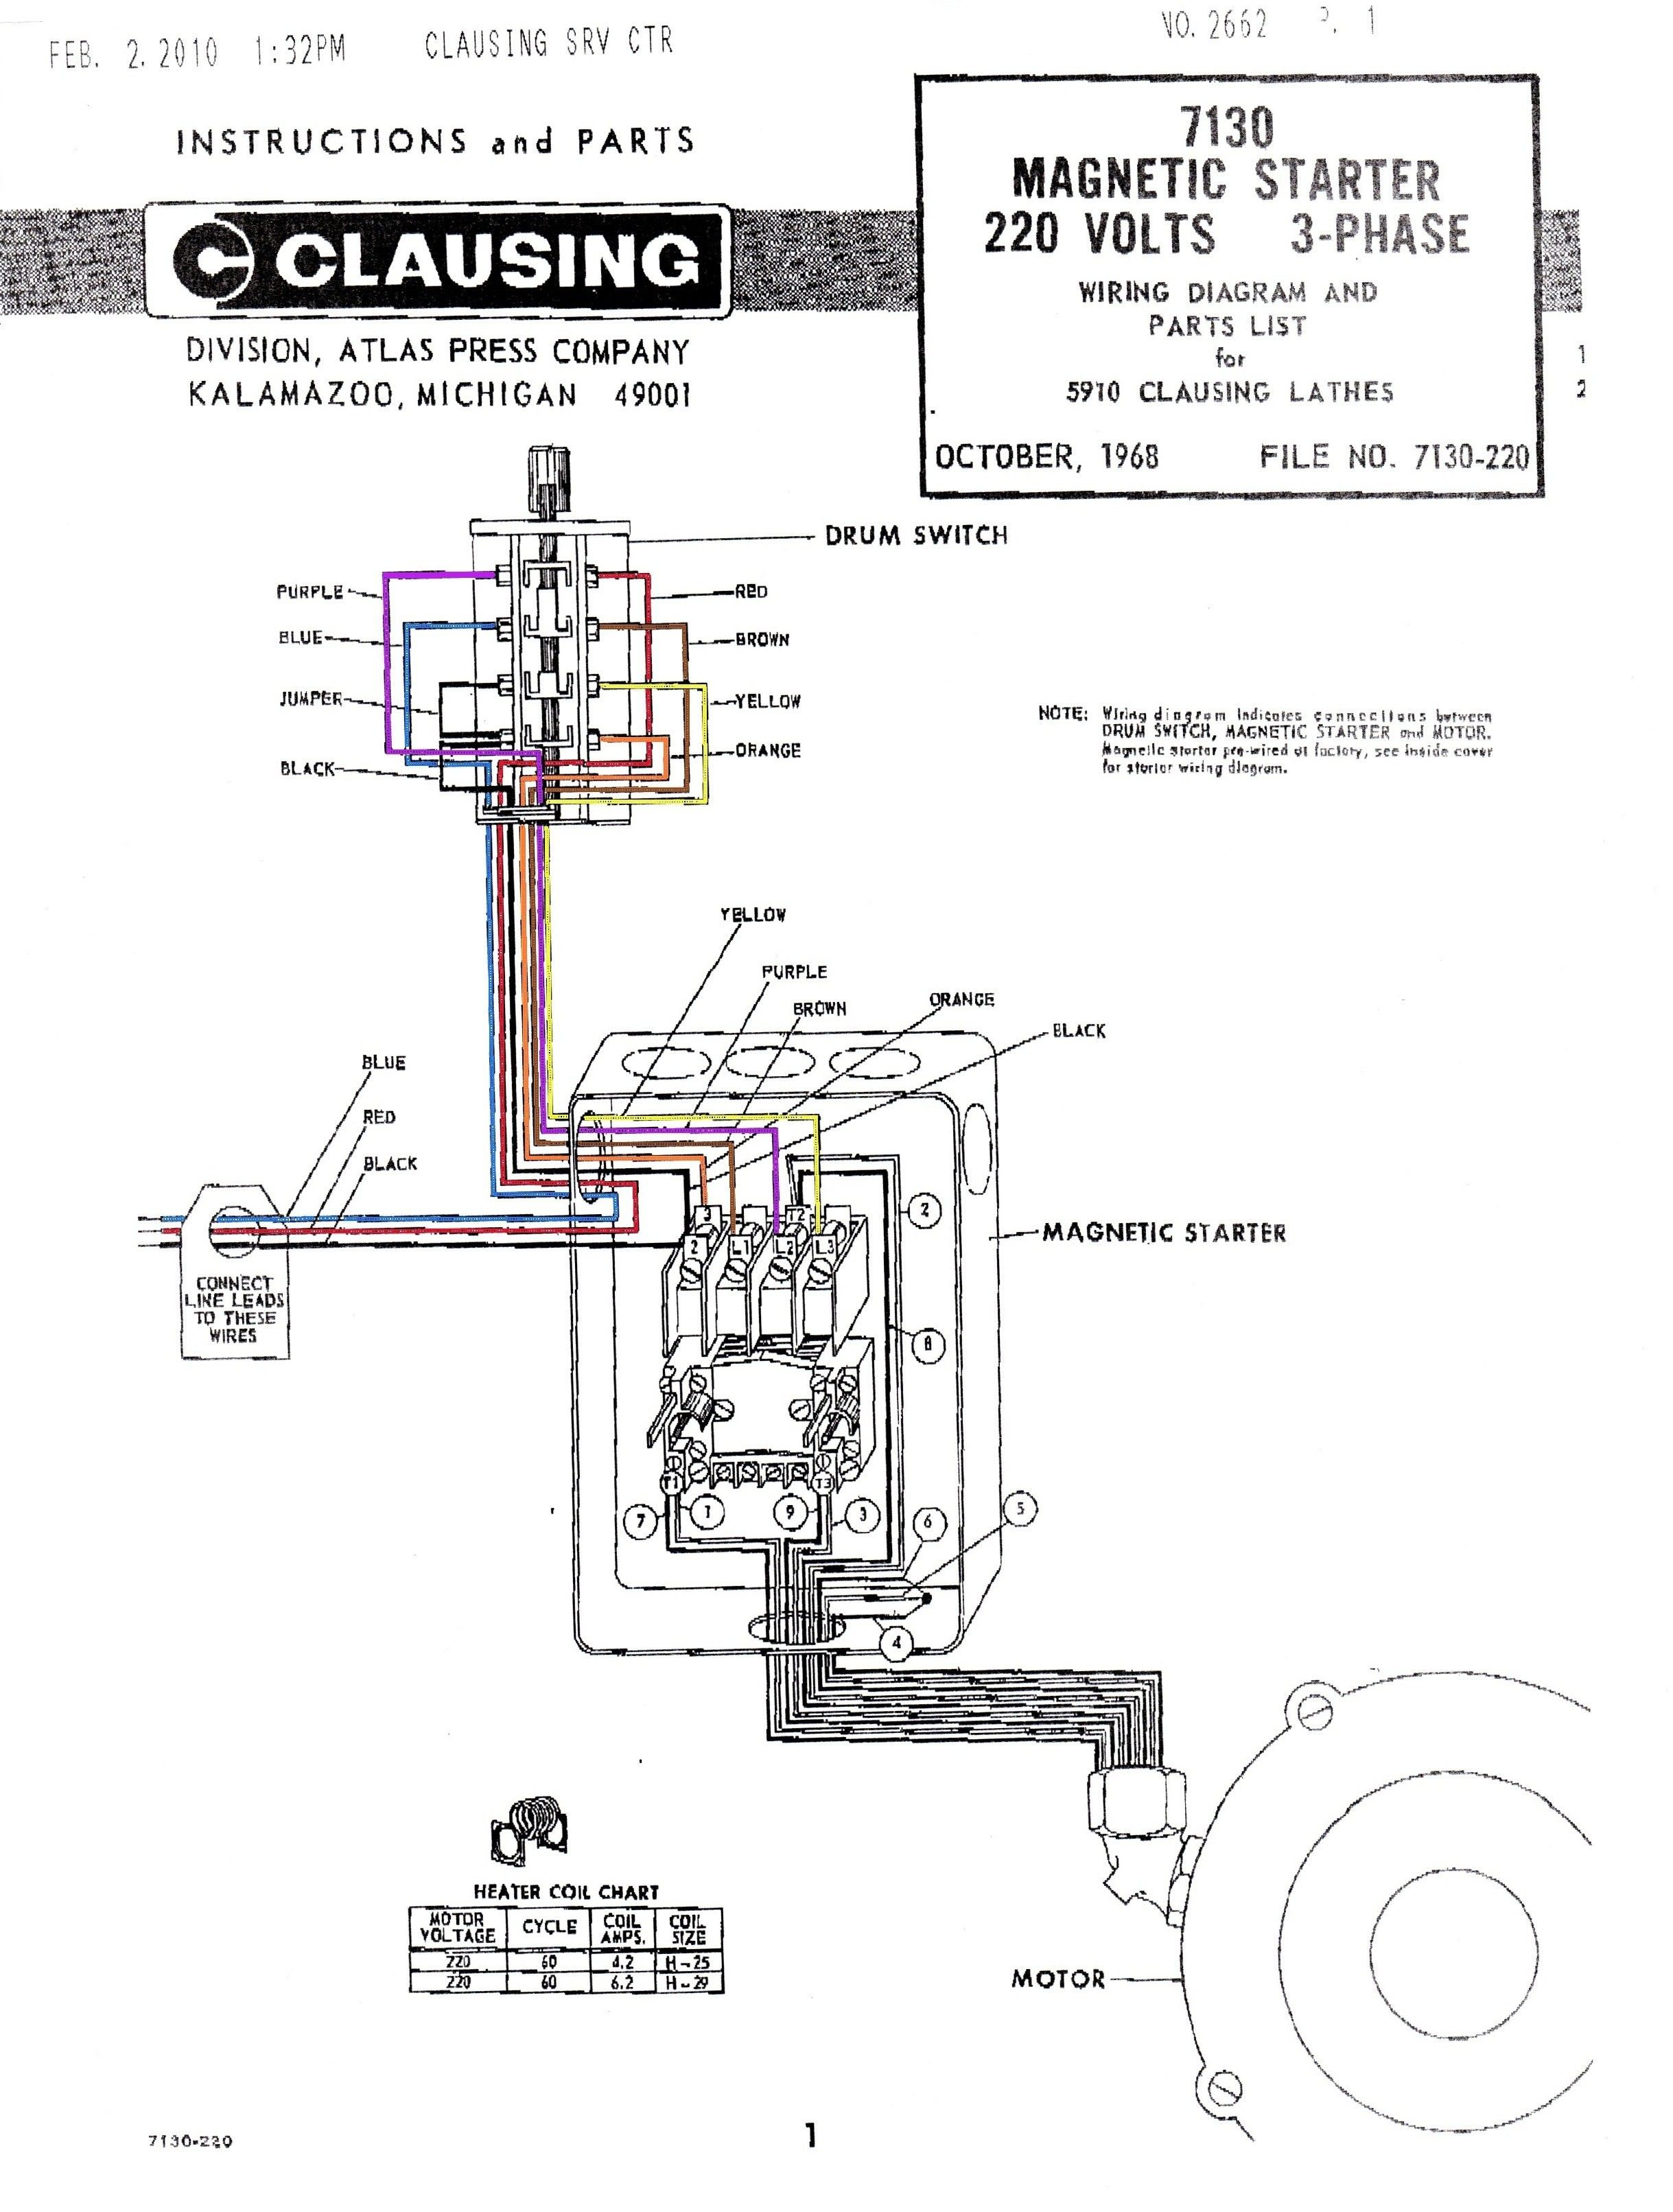 new wiring diagram for auto transformers diagram diagramtemplate diagramsample [ 2438 x 3223 Pixel ]